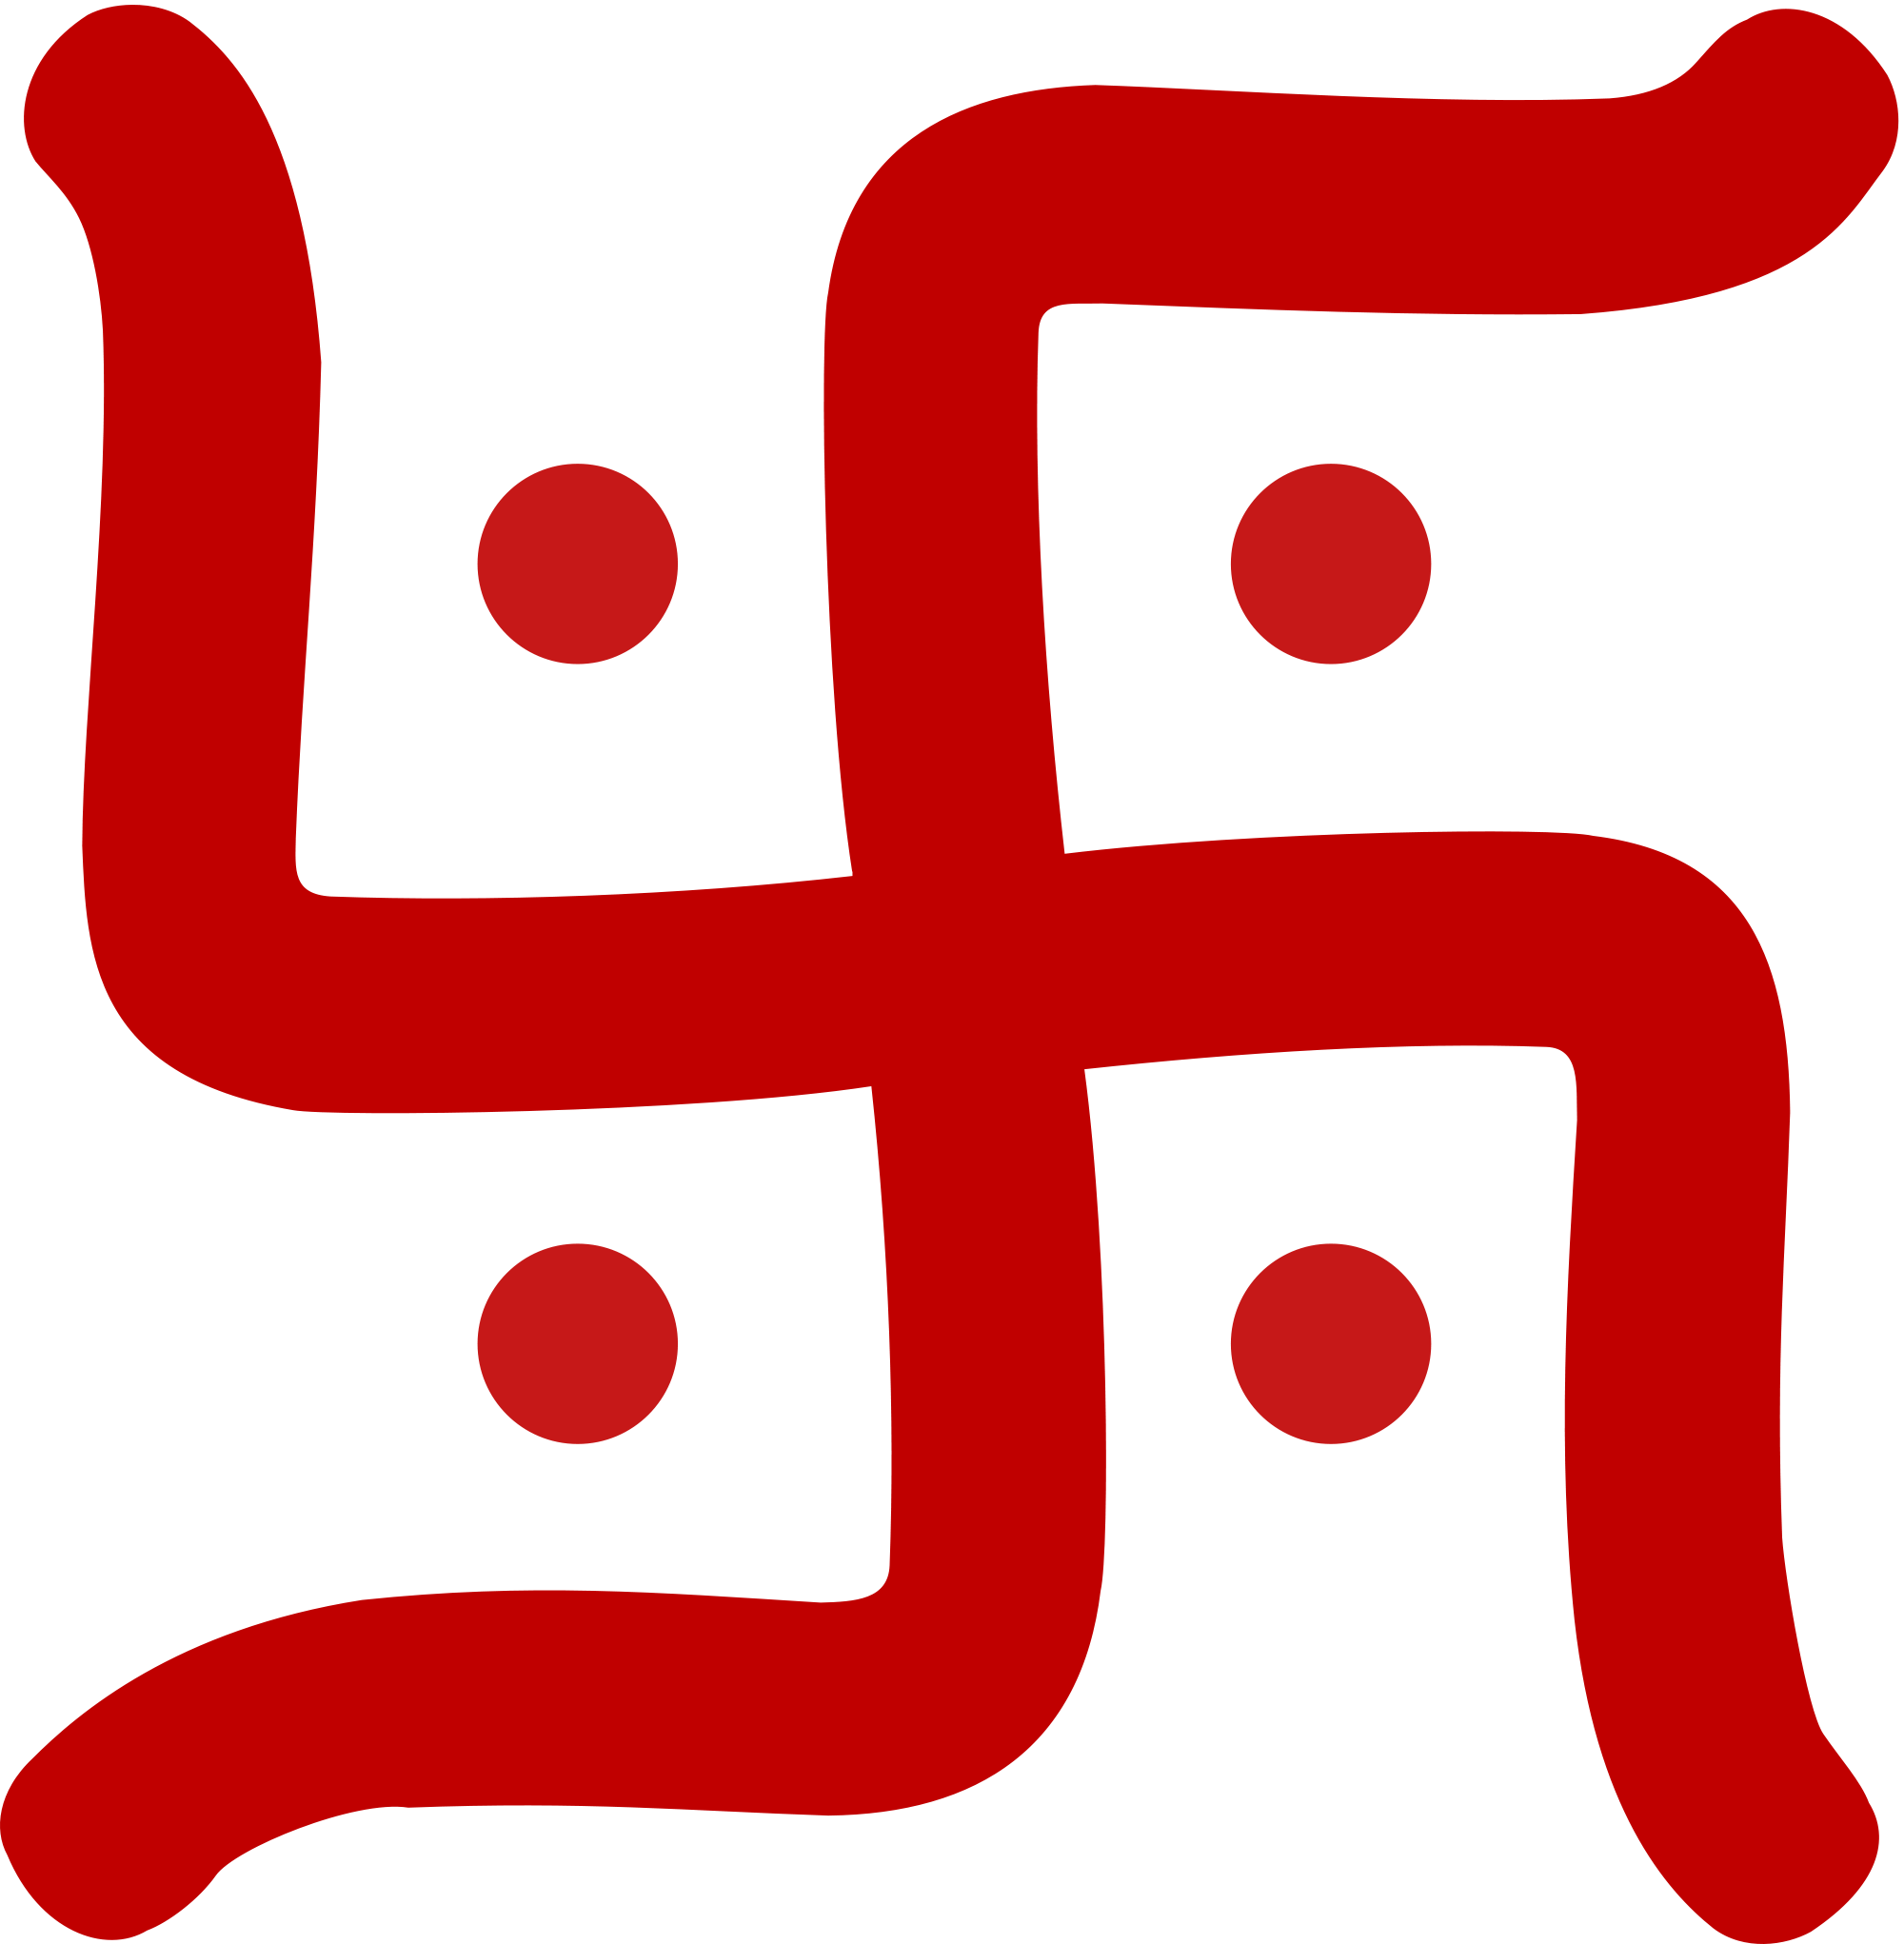 Swastika Logo - ClipArt Best